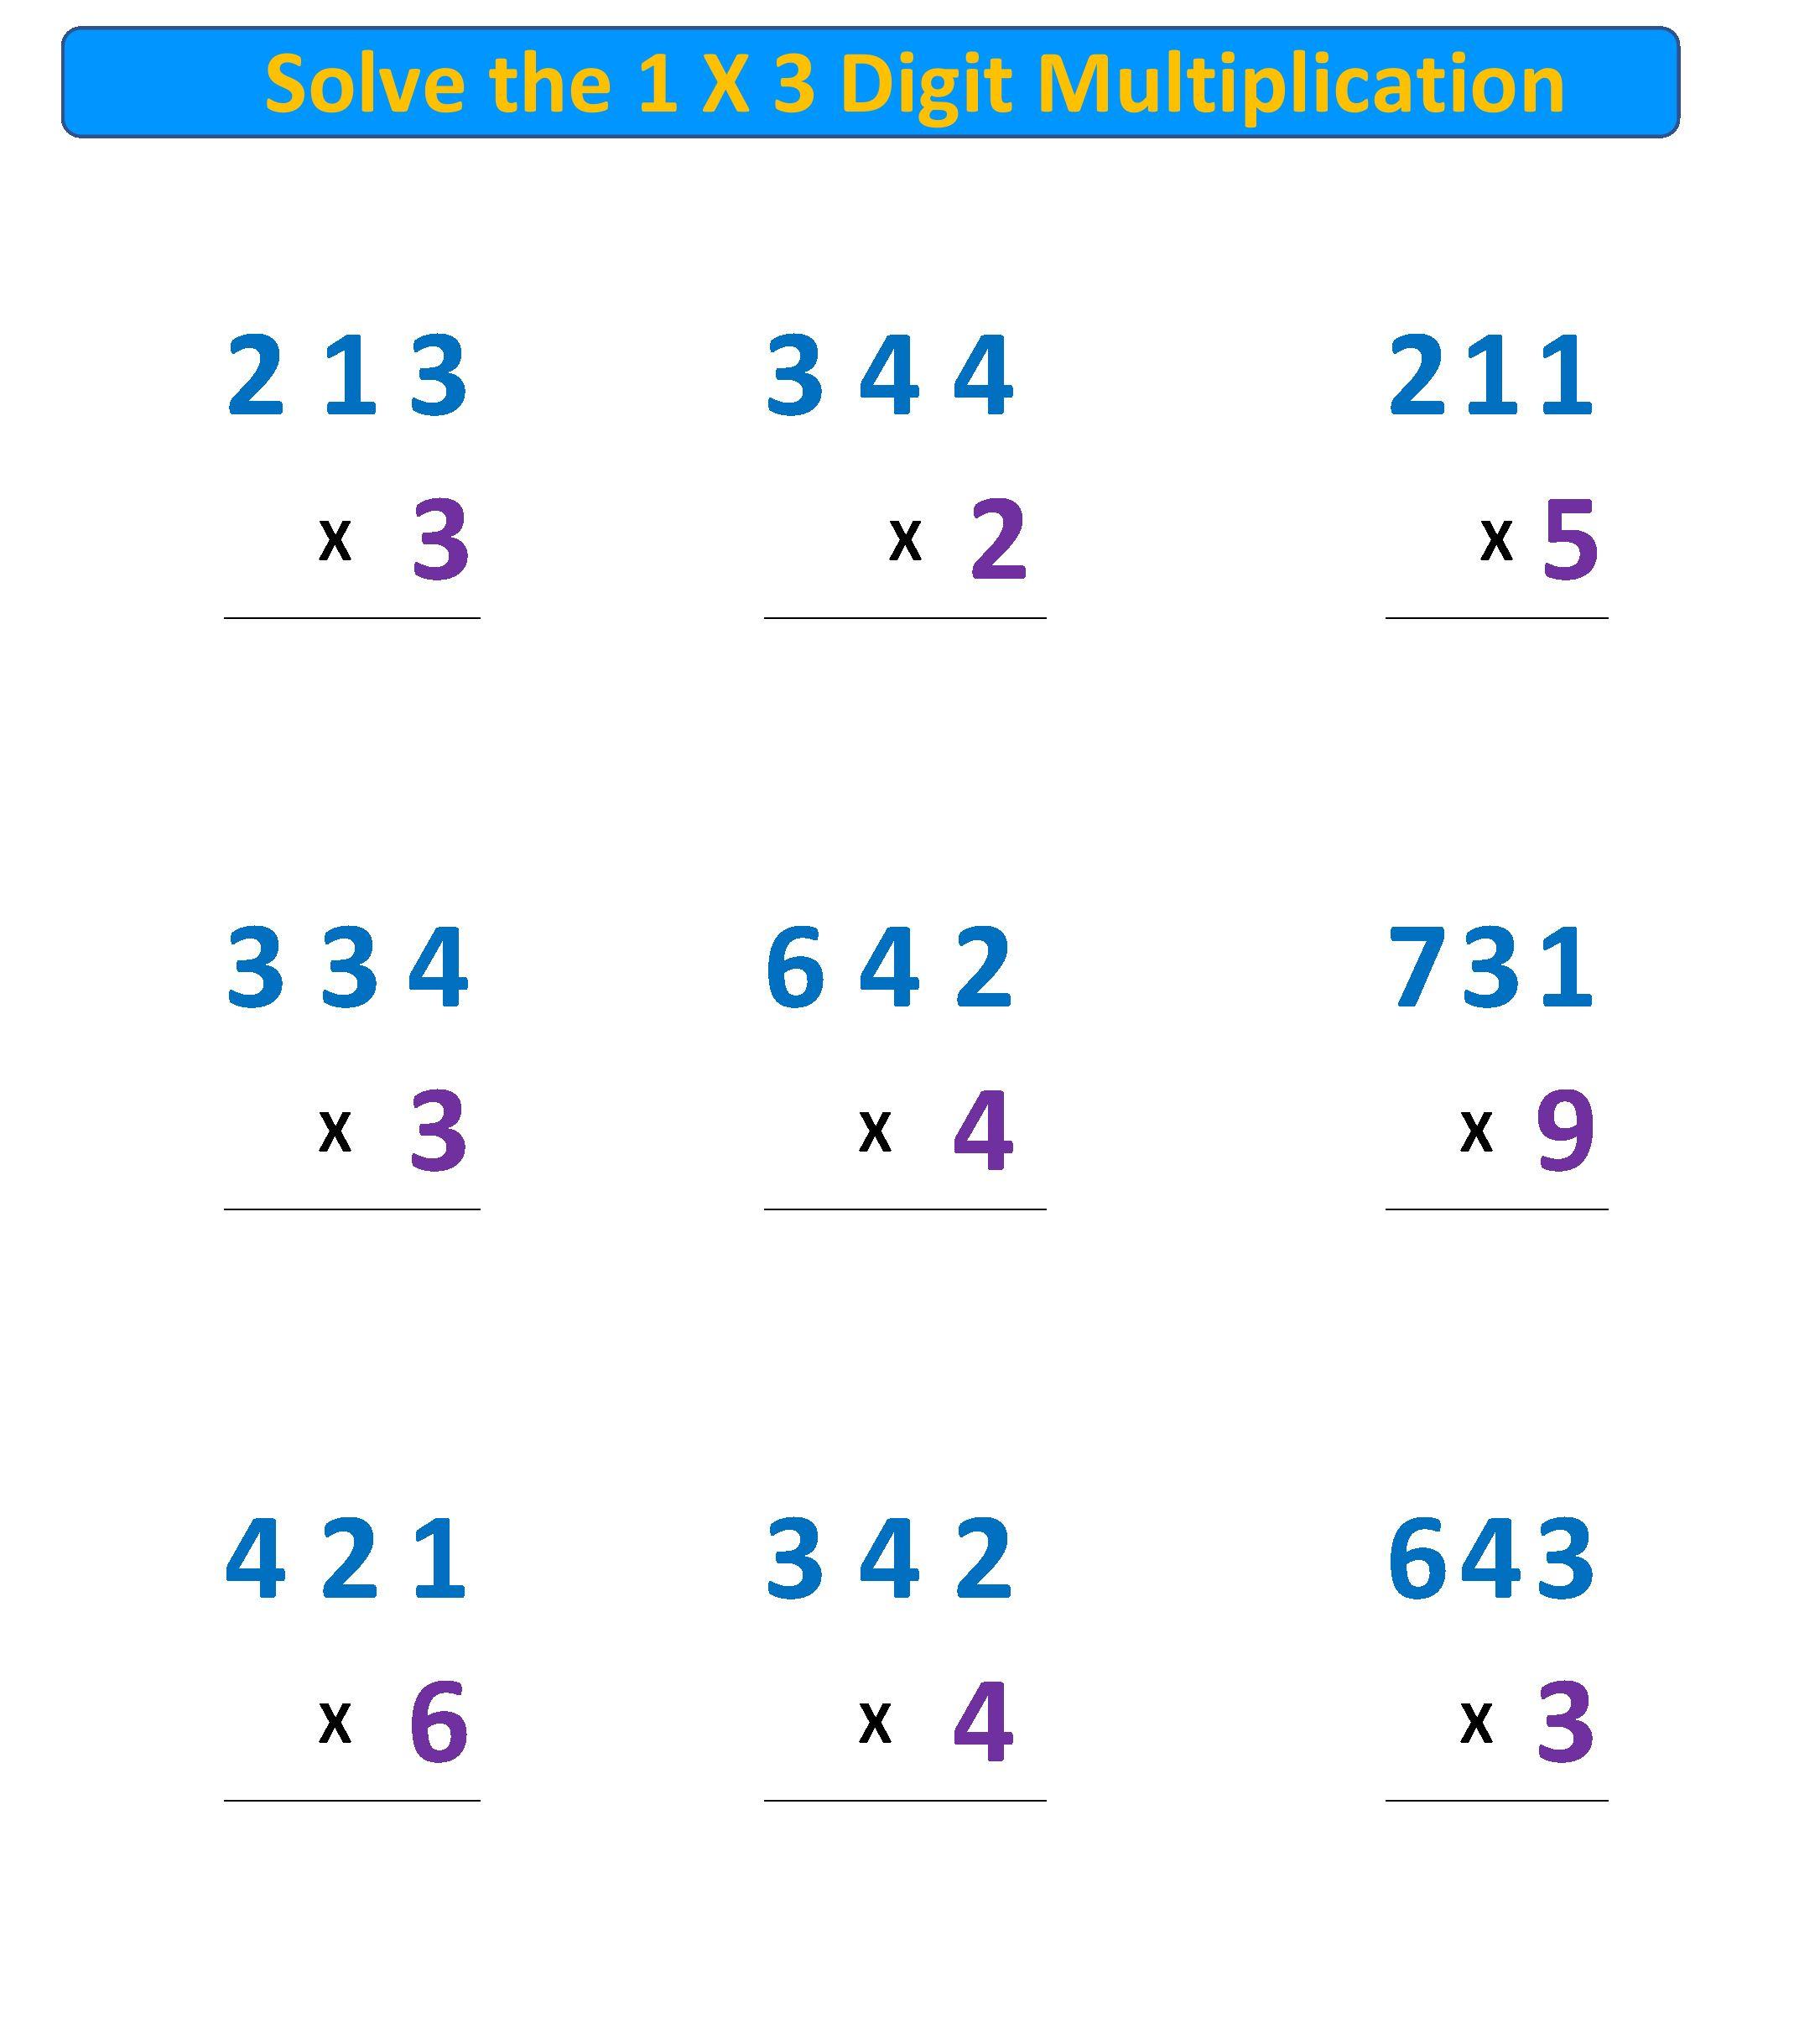 Free Multiplication Worksheet Standard Algorithm 1 X 3 Digit With Regrouping Free Multiplication Worksheets Free Math Worksheets Multiplication Problems